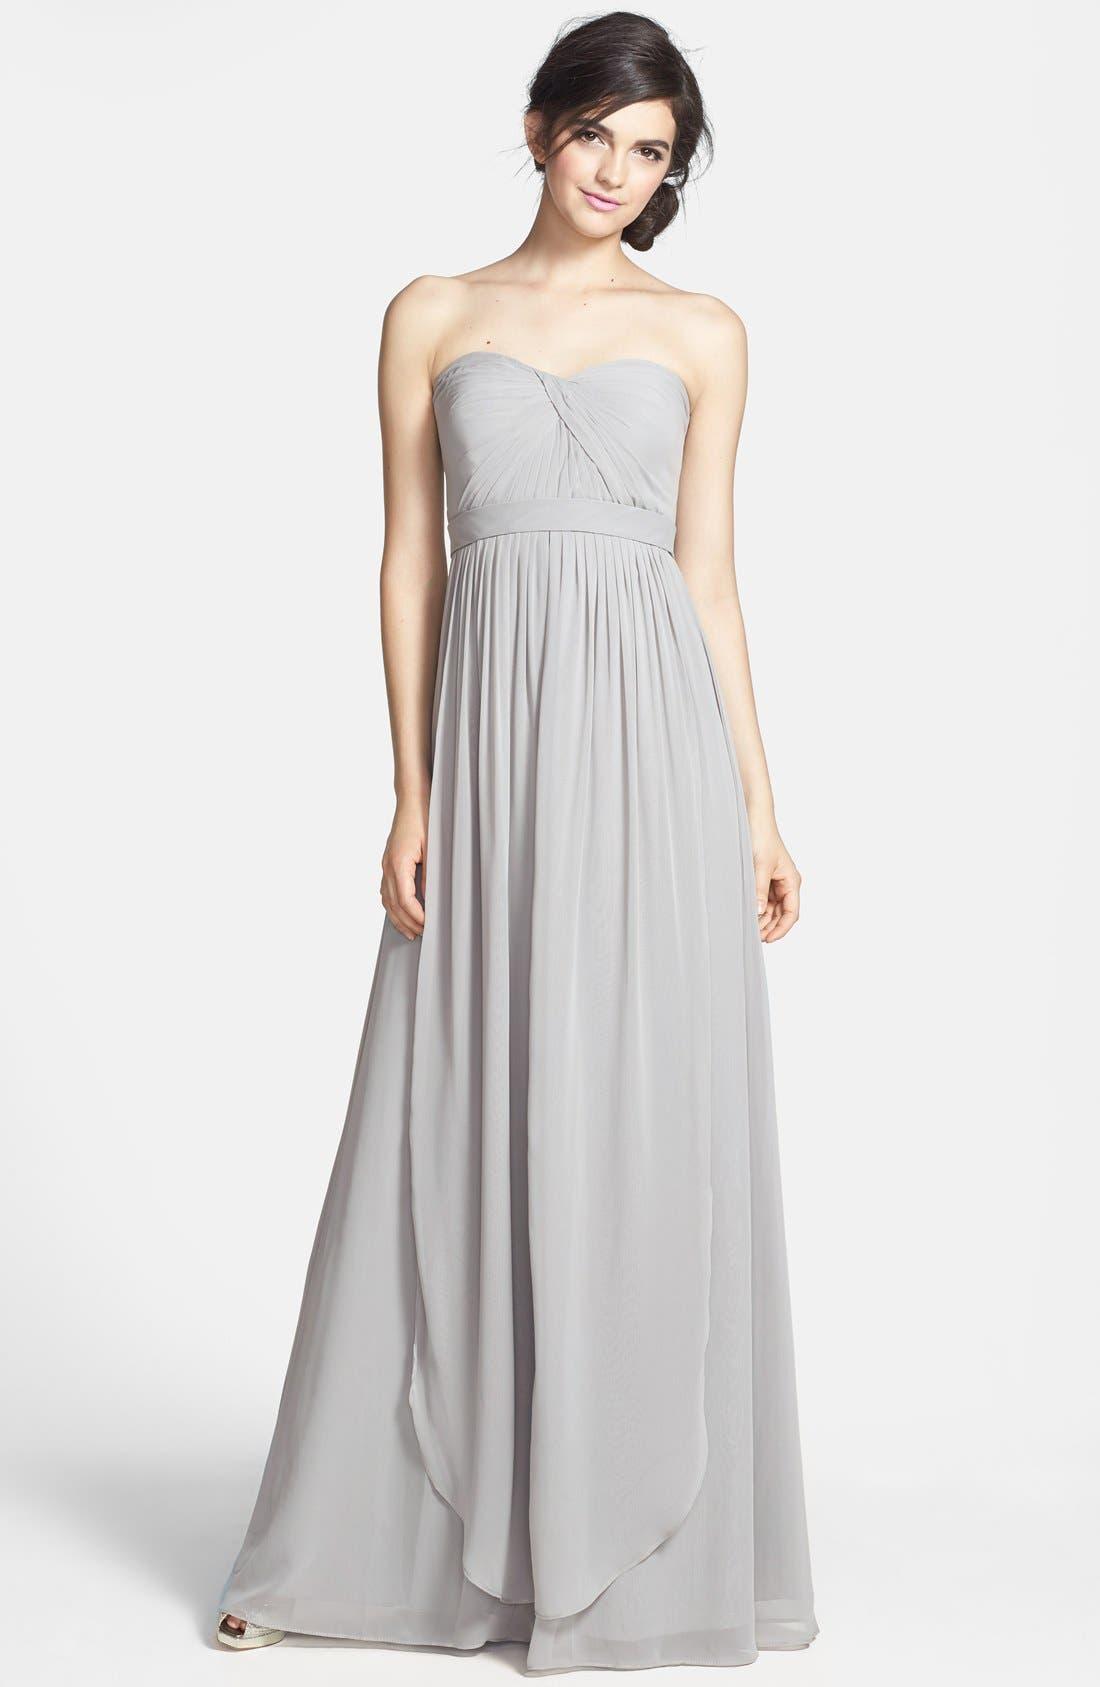 Alternate Image 1 Selected - Jenny Yoo 'Aidan' Convertible Strapless Chiffon Gown